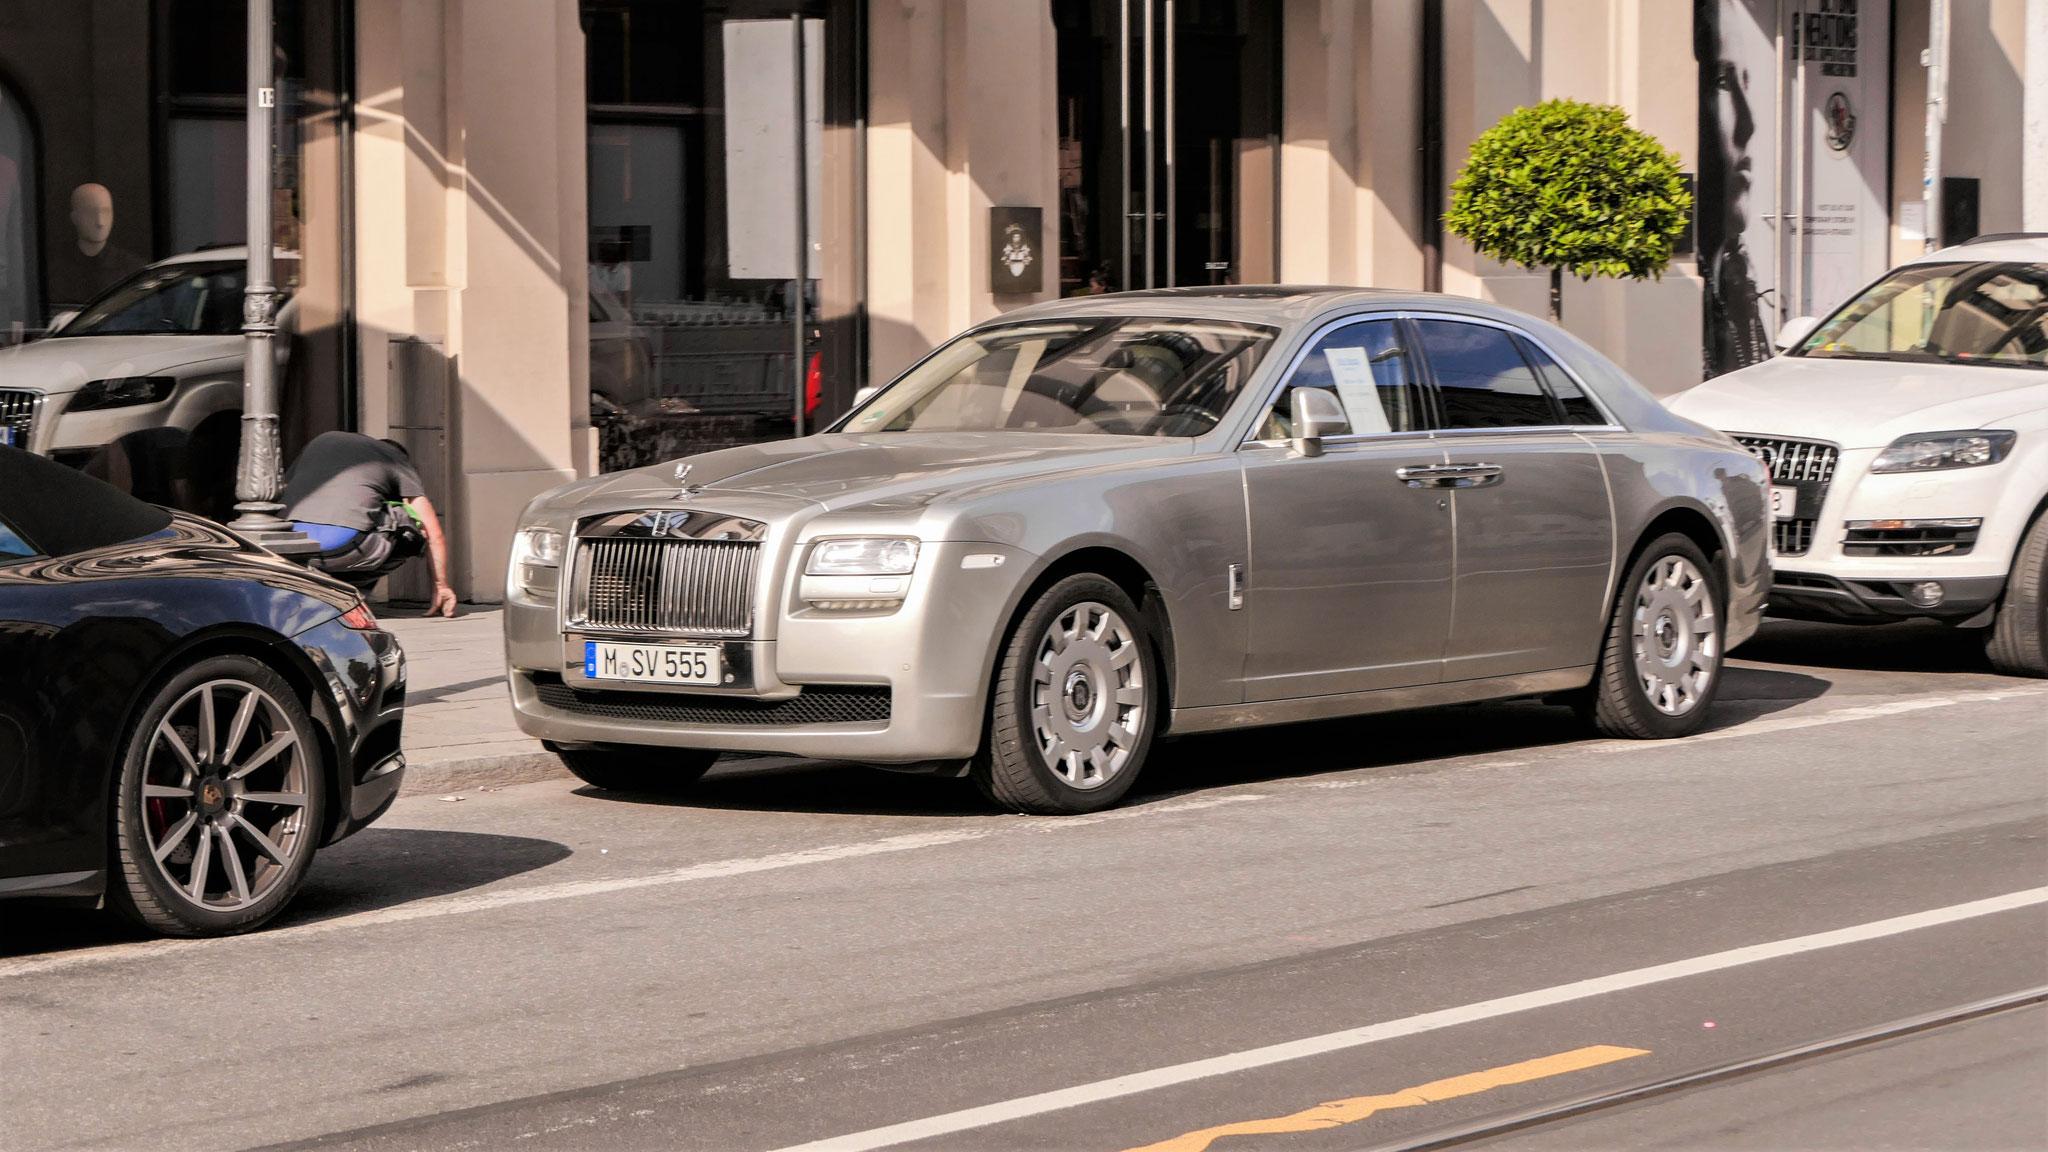 Rolls Royce Ghost - M-SV-555